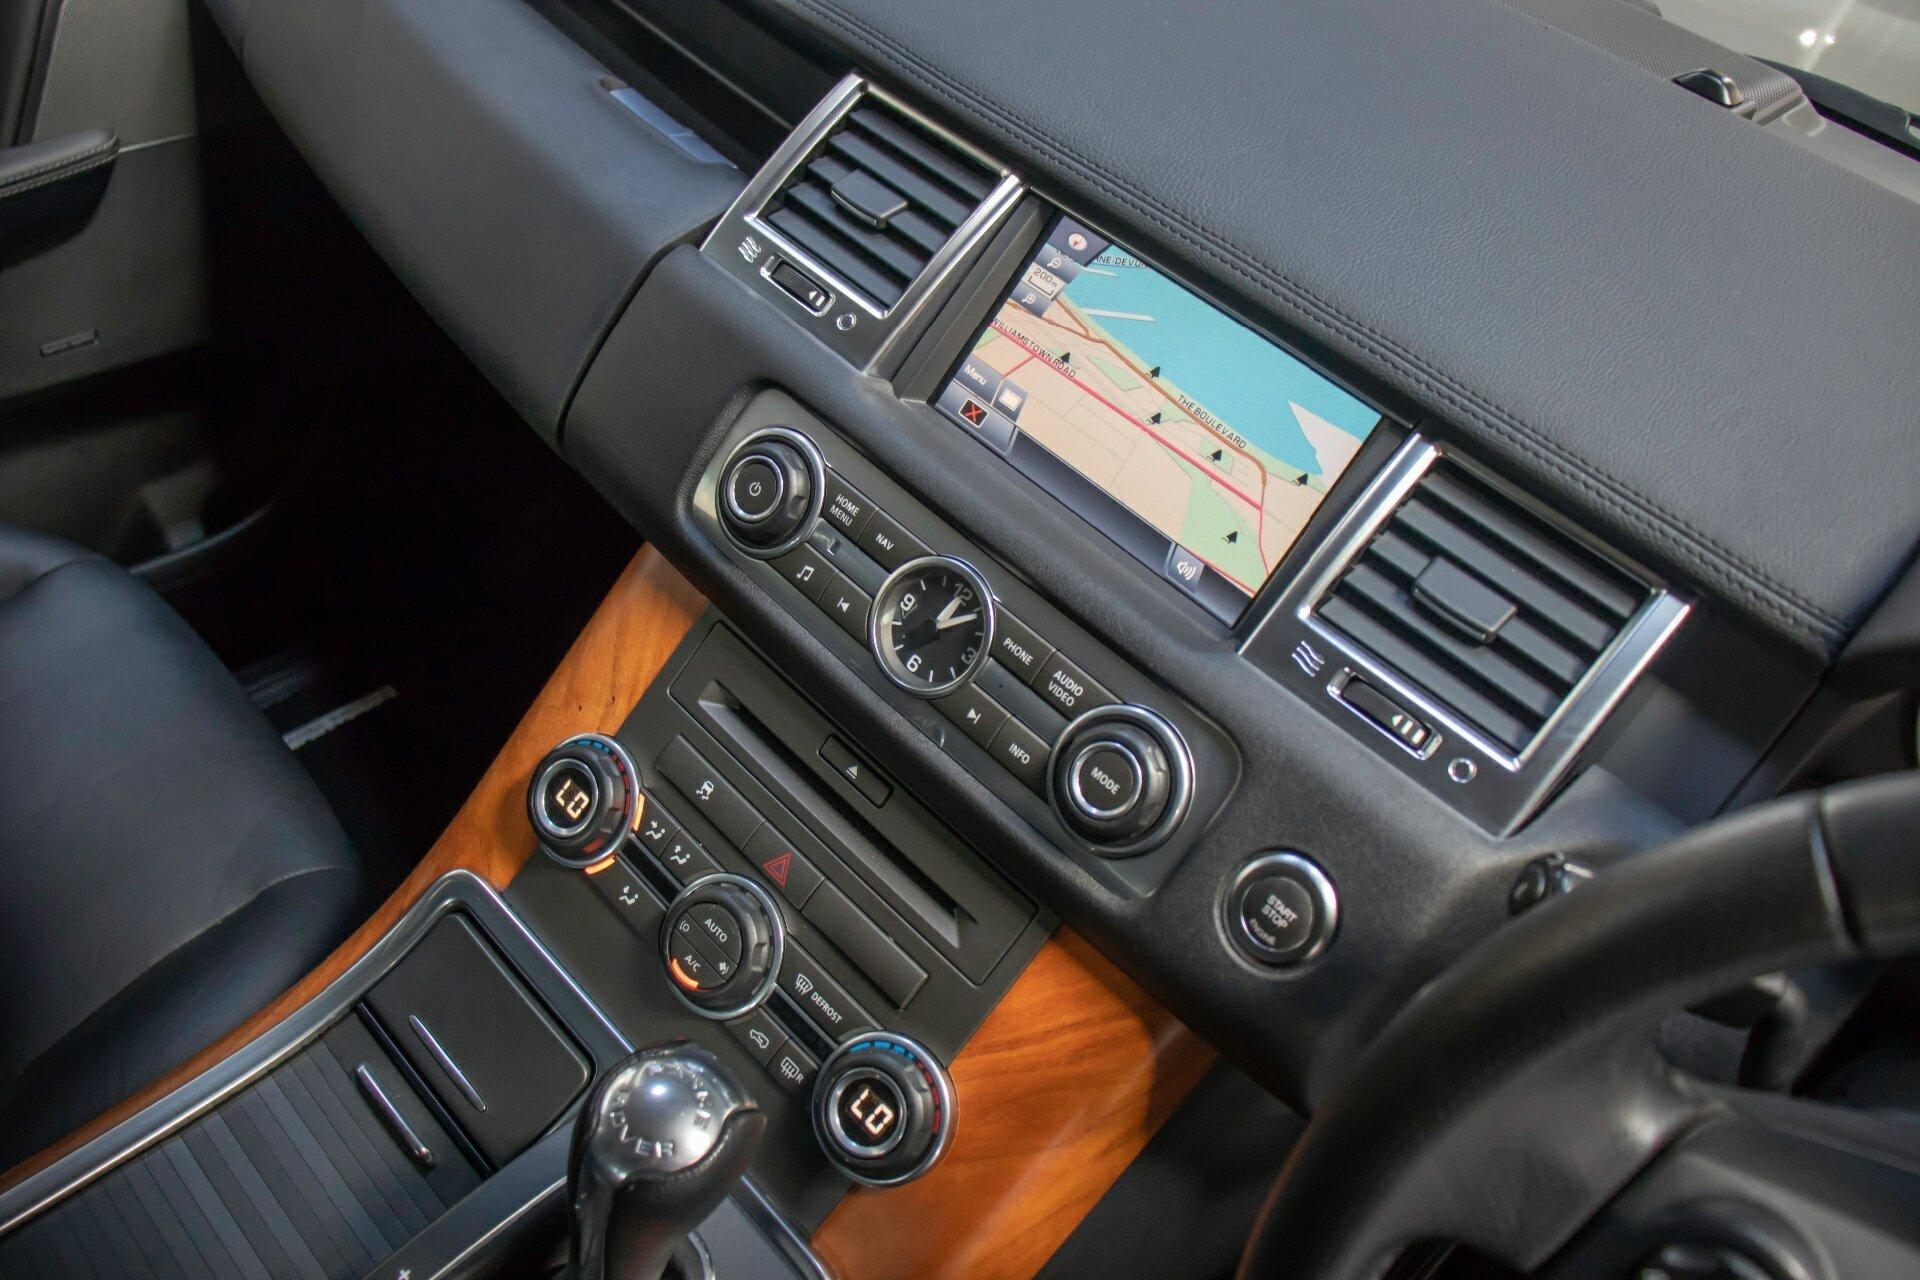 2010 Land Rover Range Rover Sport 3.0 Tdv6 My10